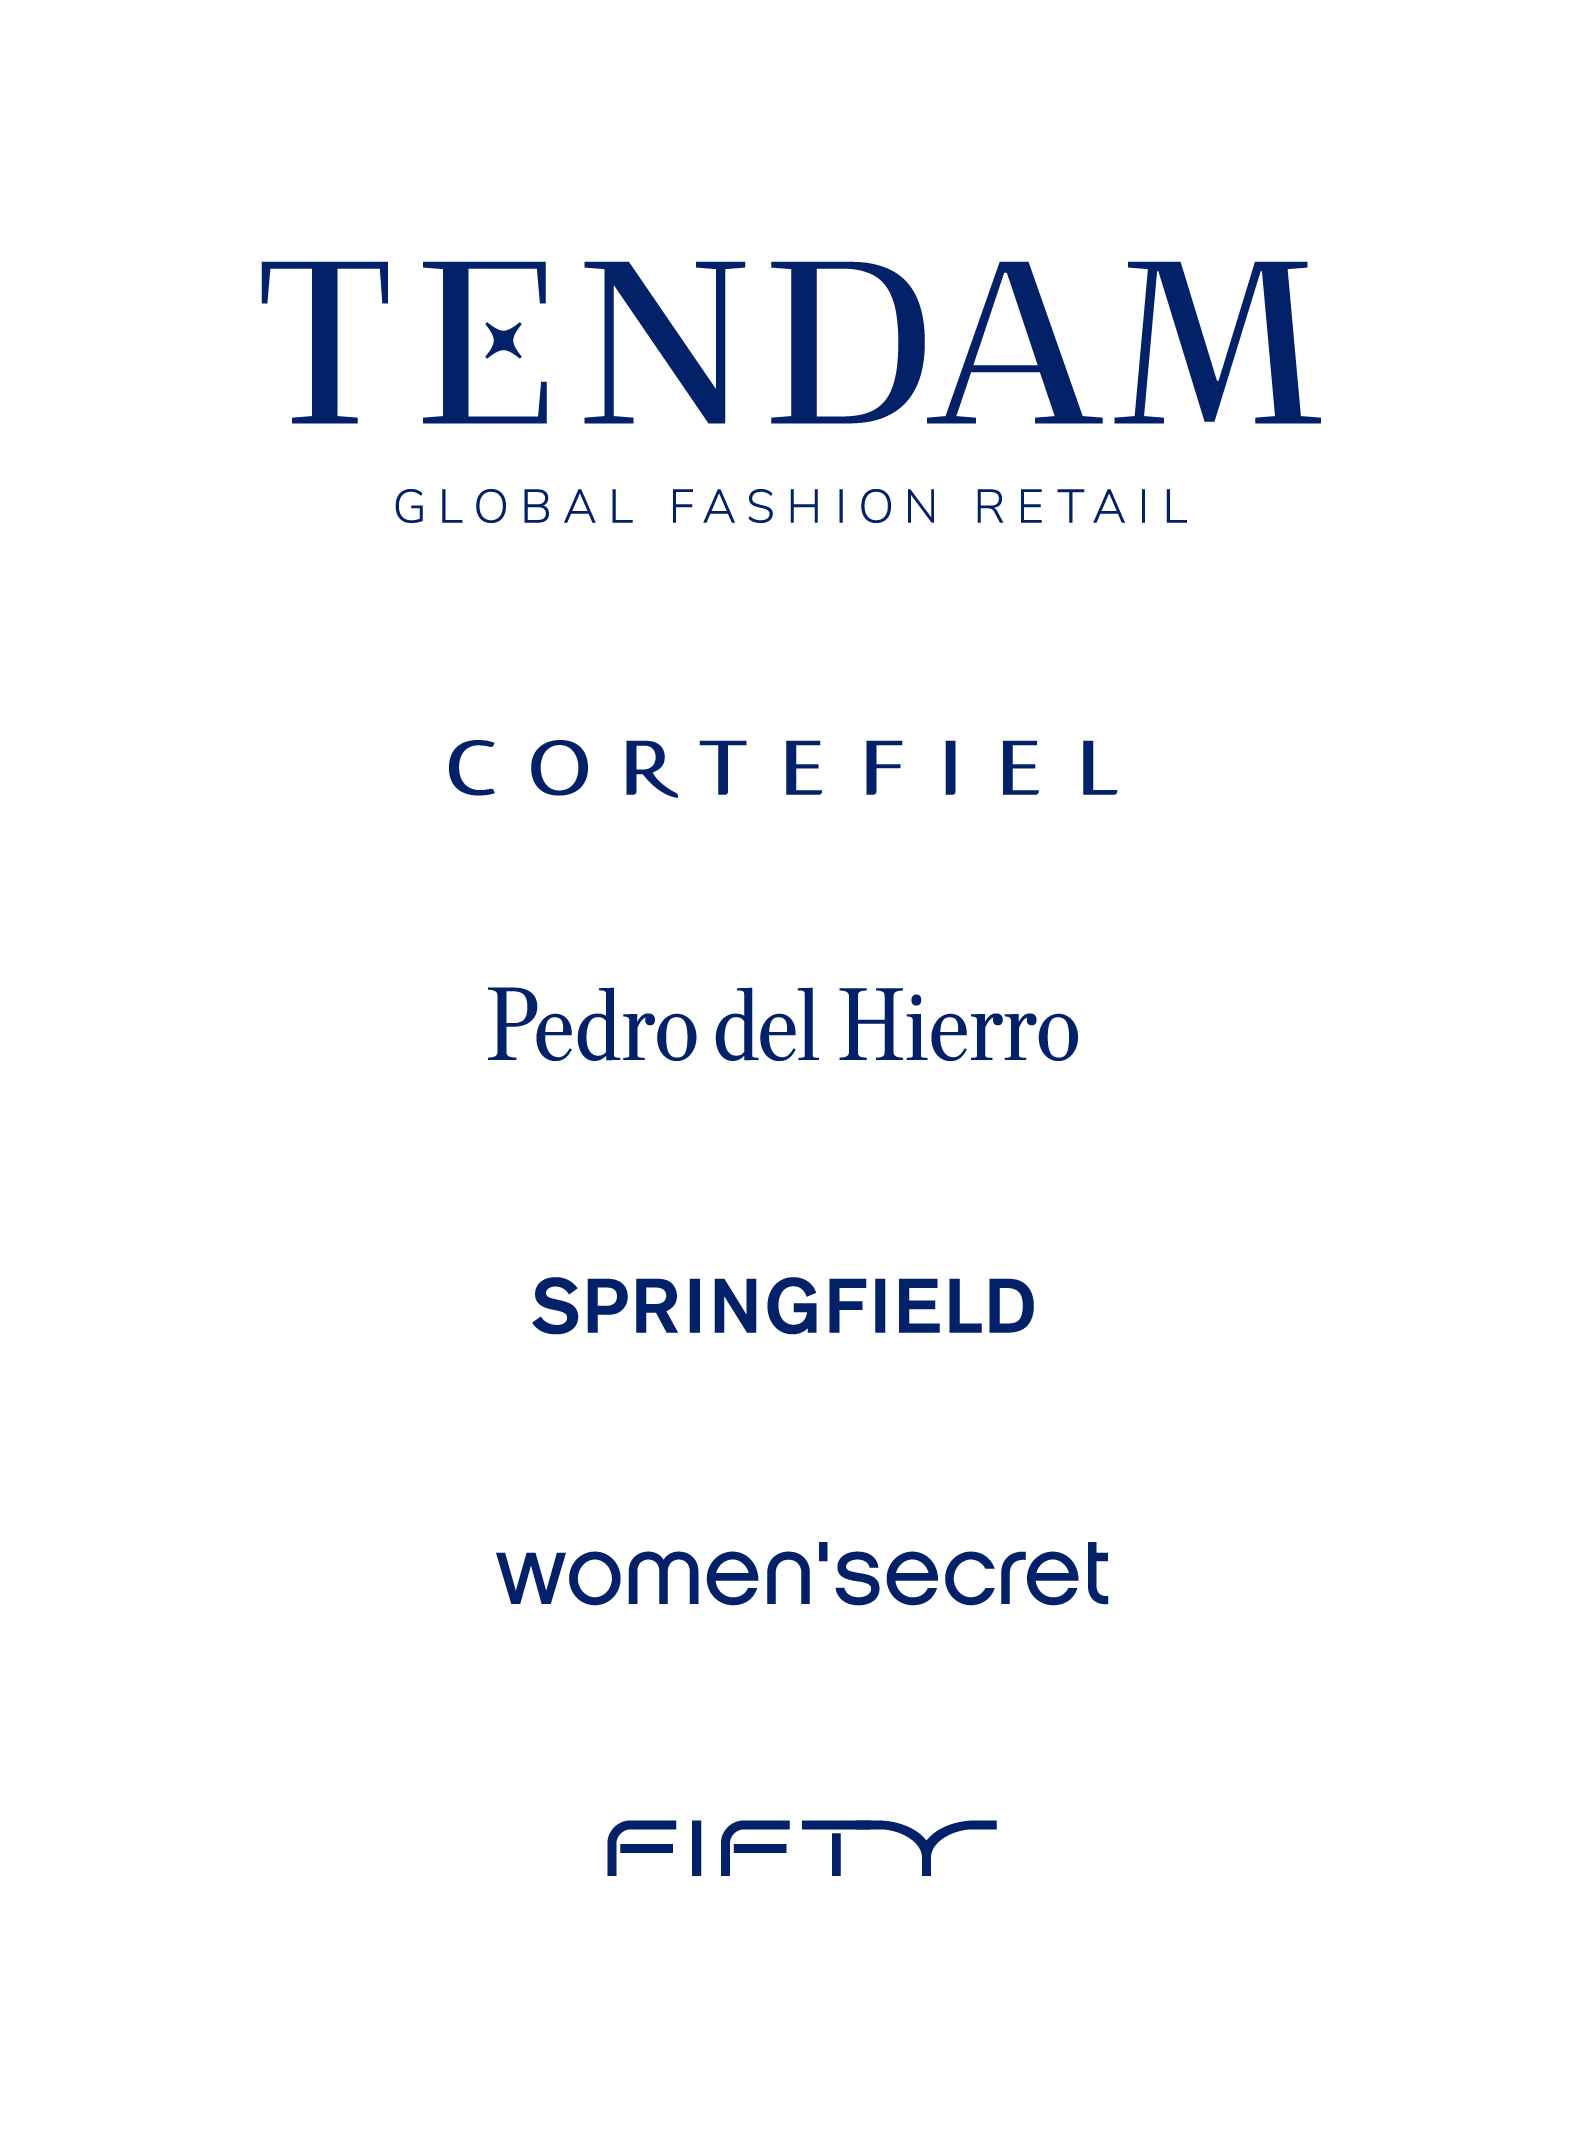 TENDAM